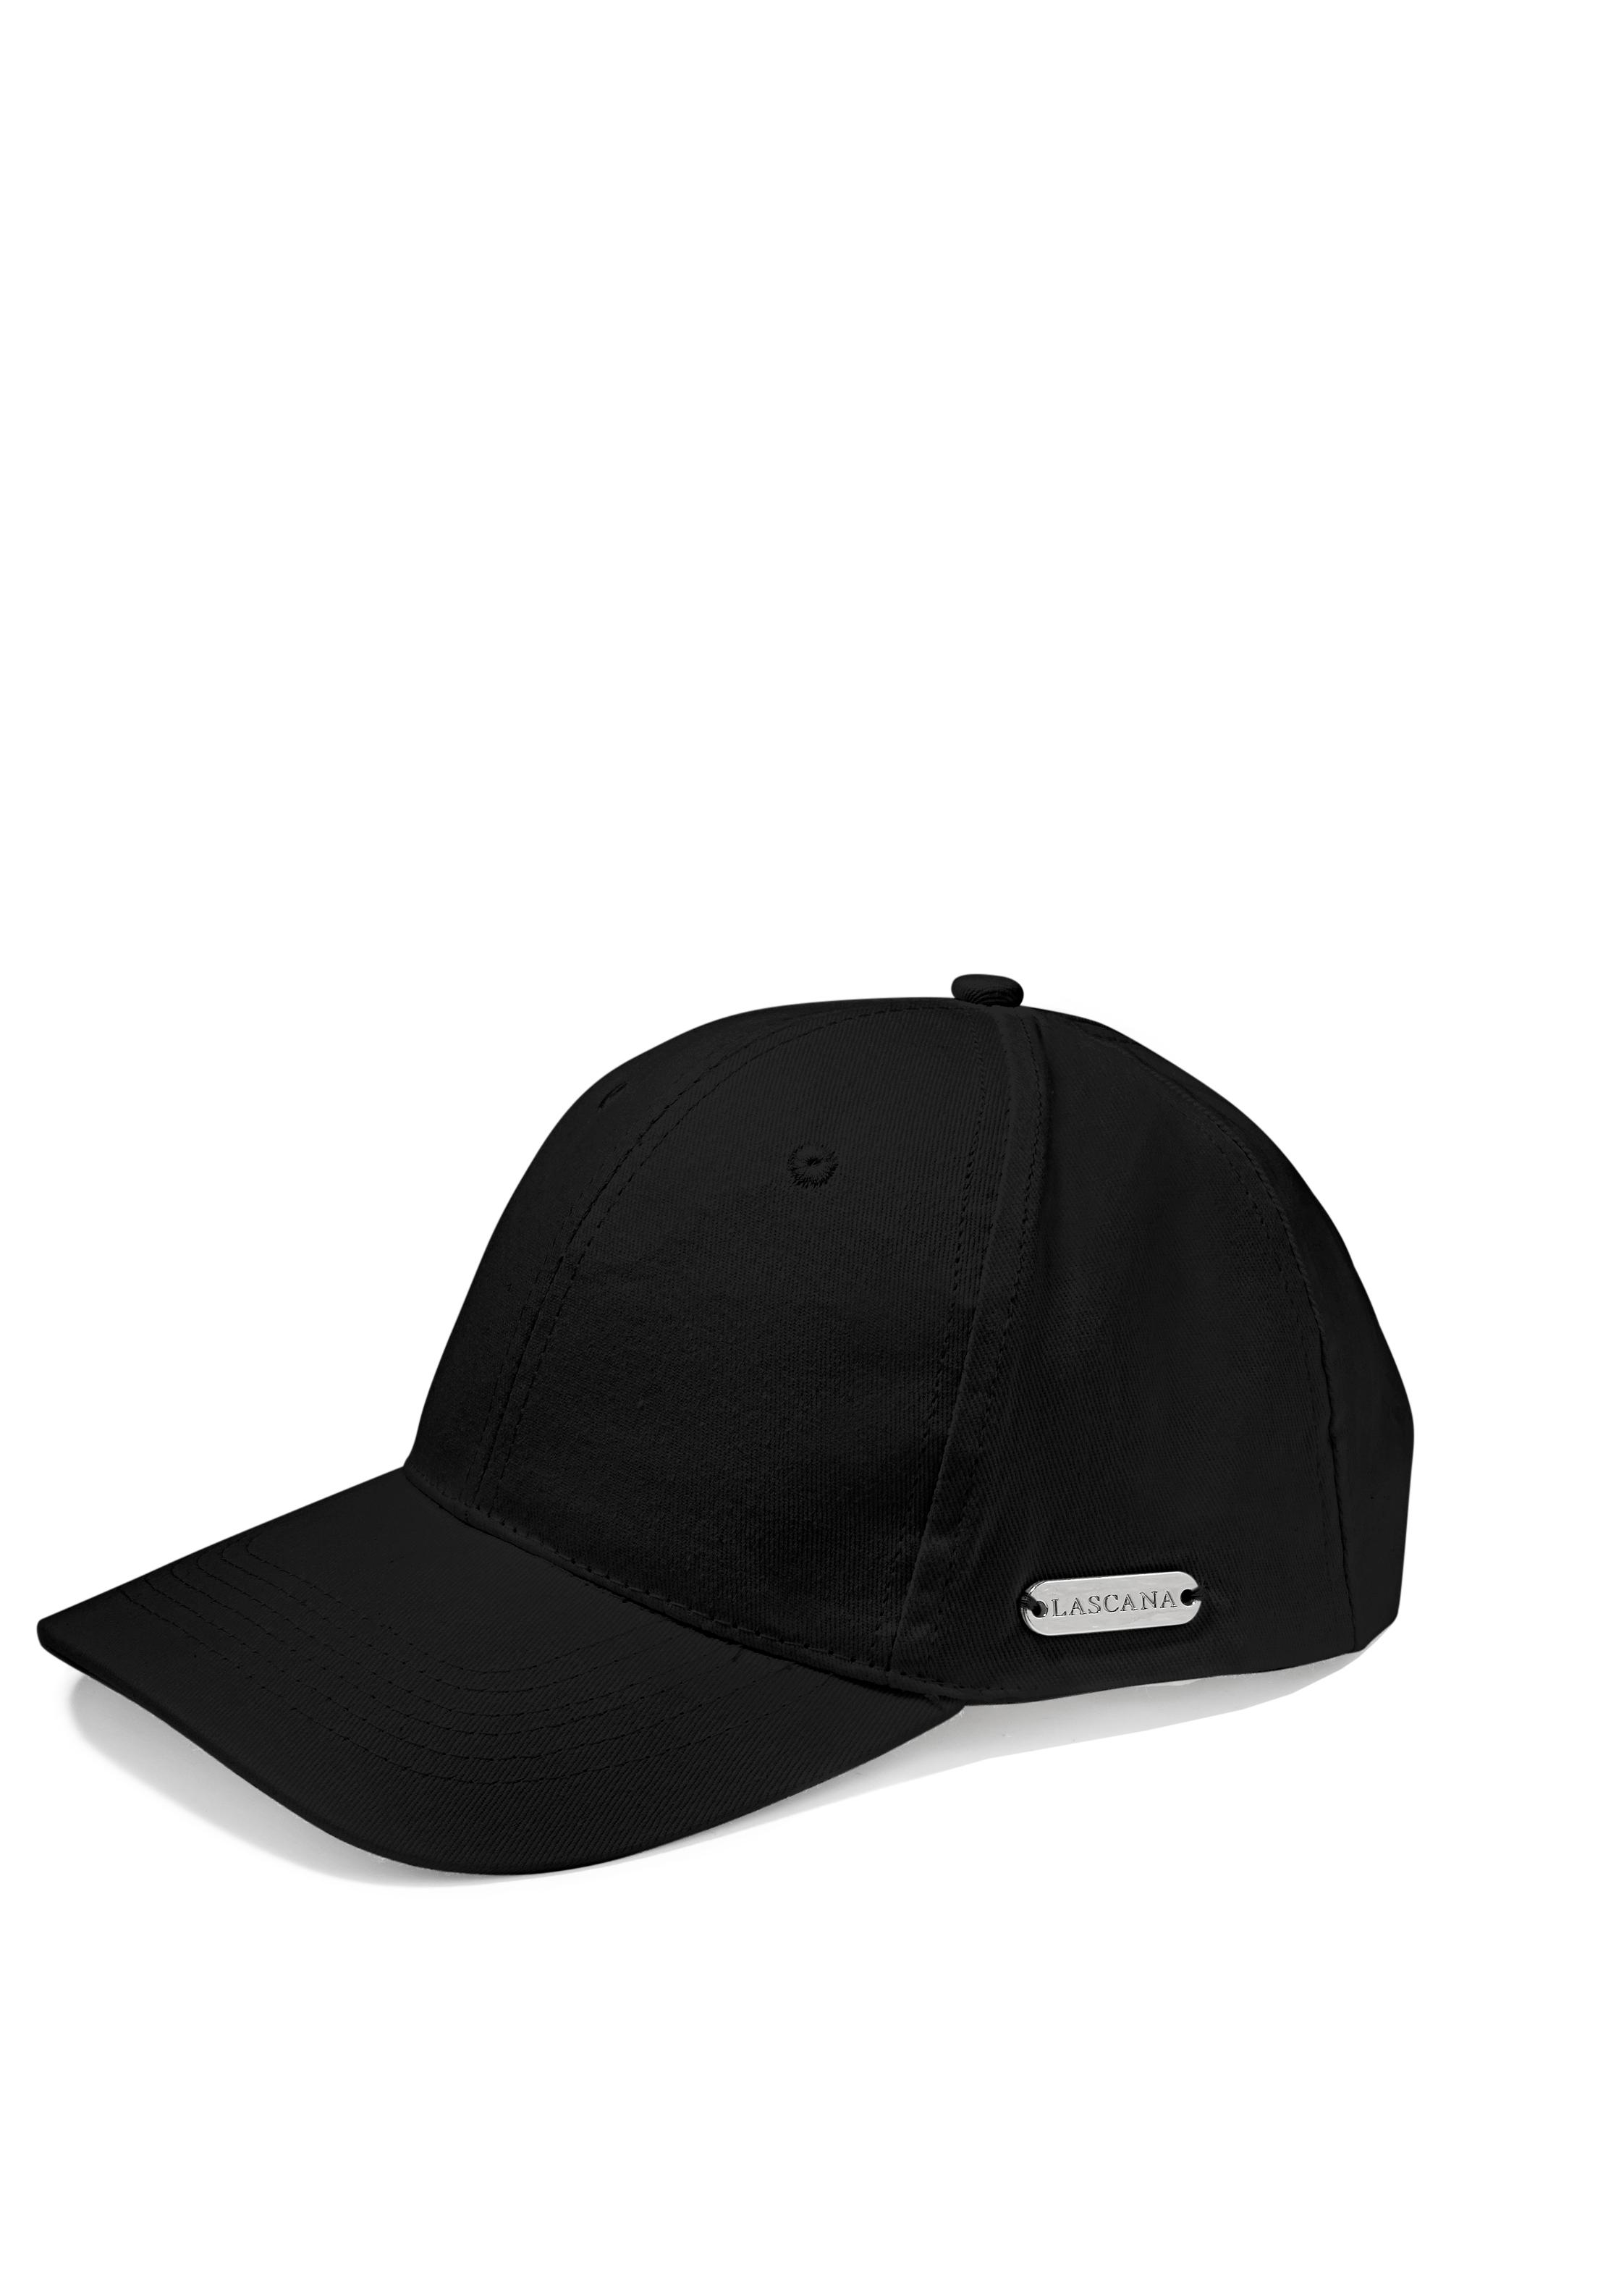 LASCANA Baseball Cap